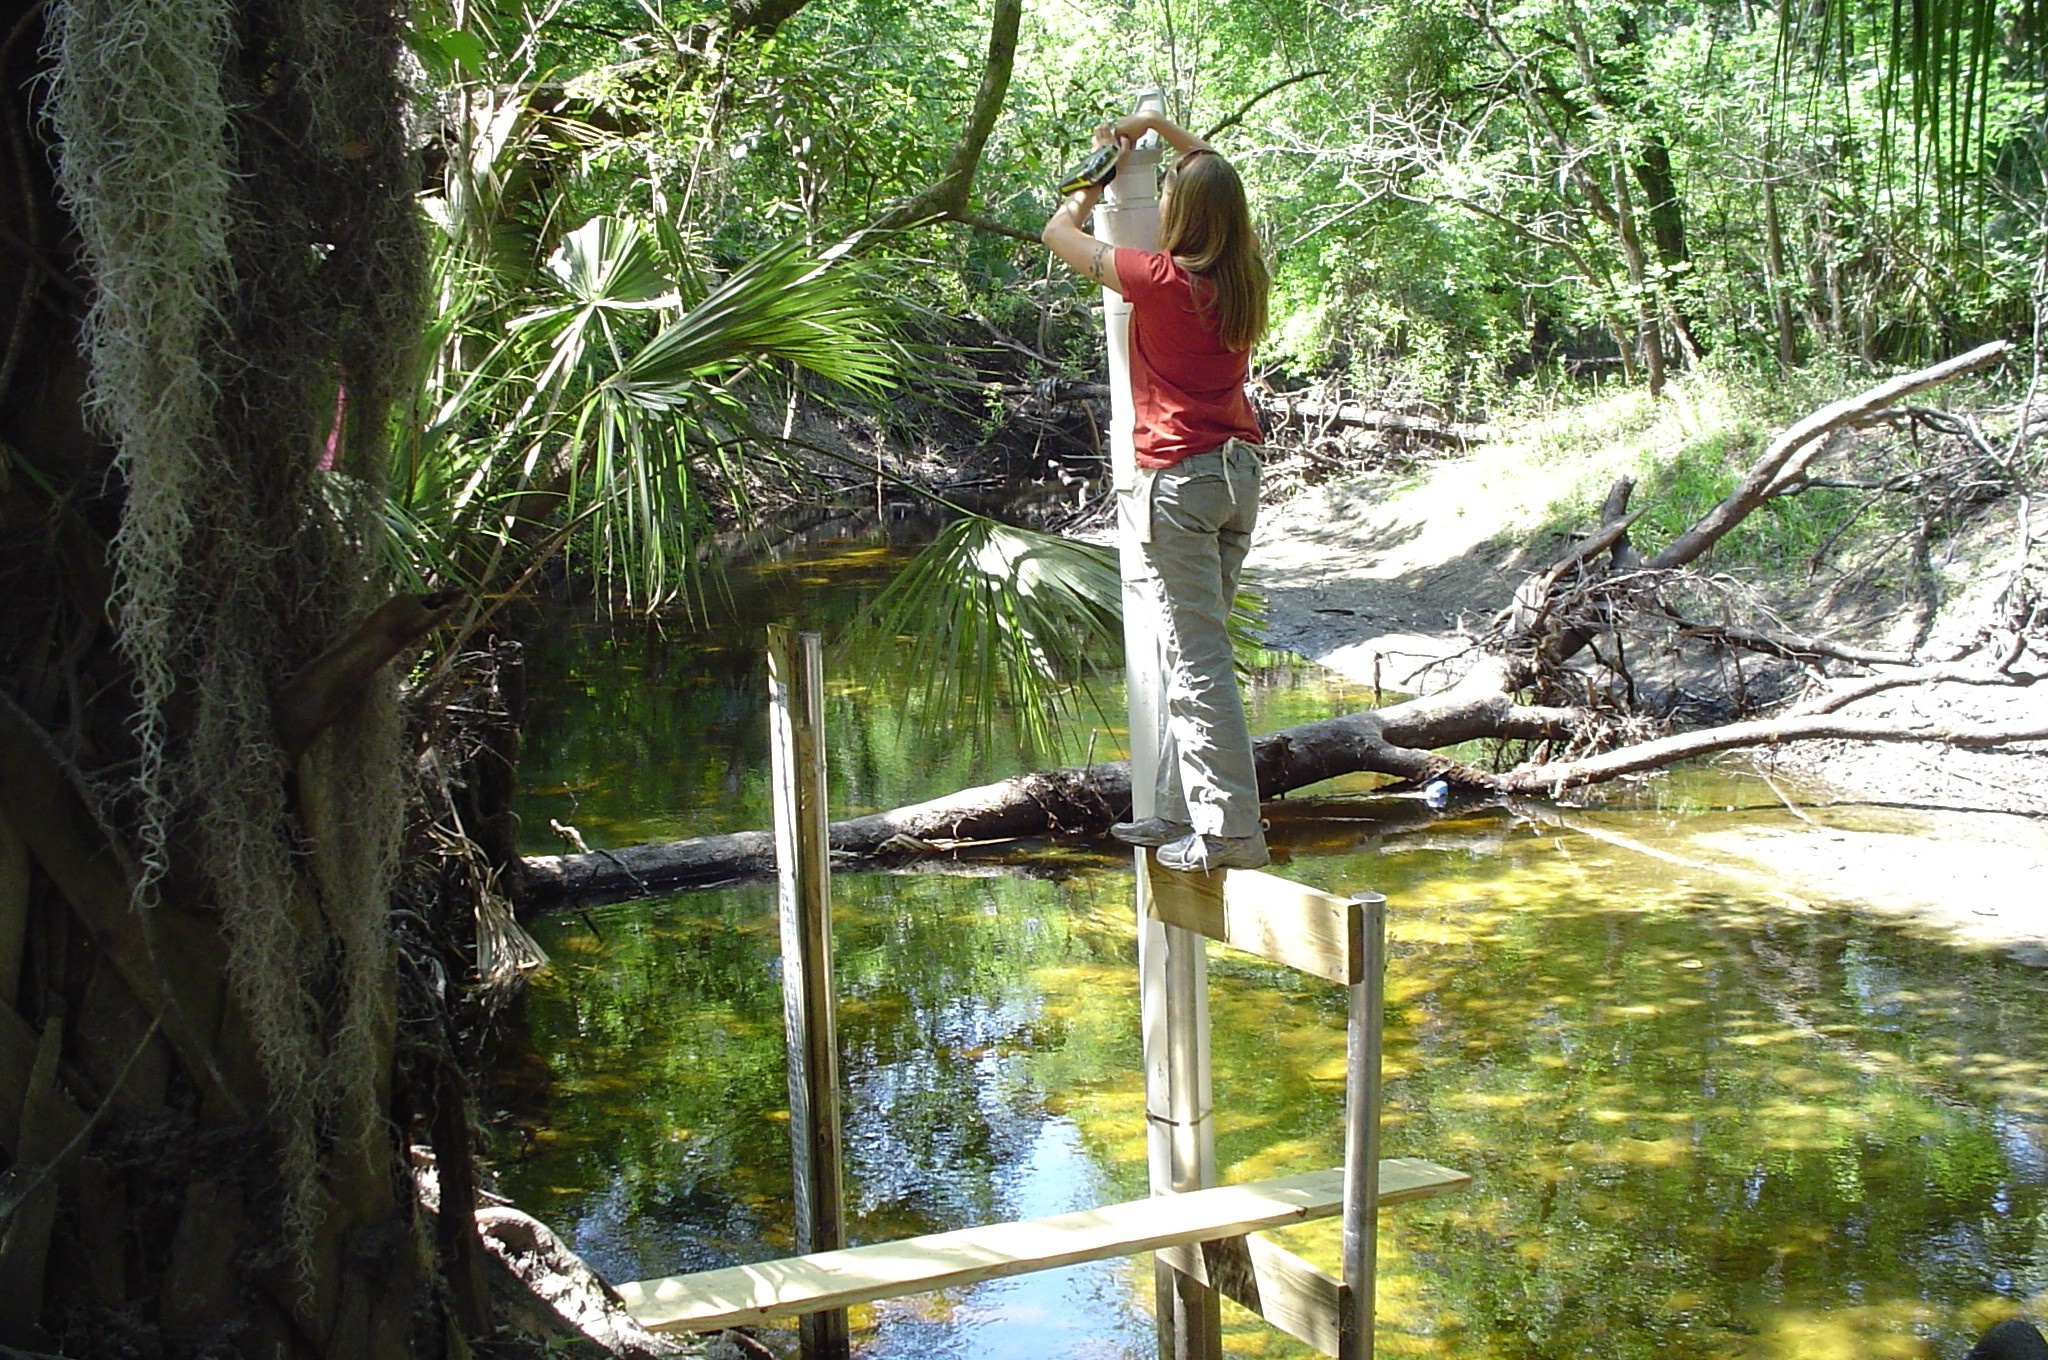 Environmental field hydrology work